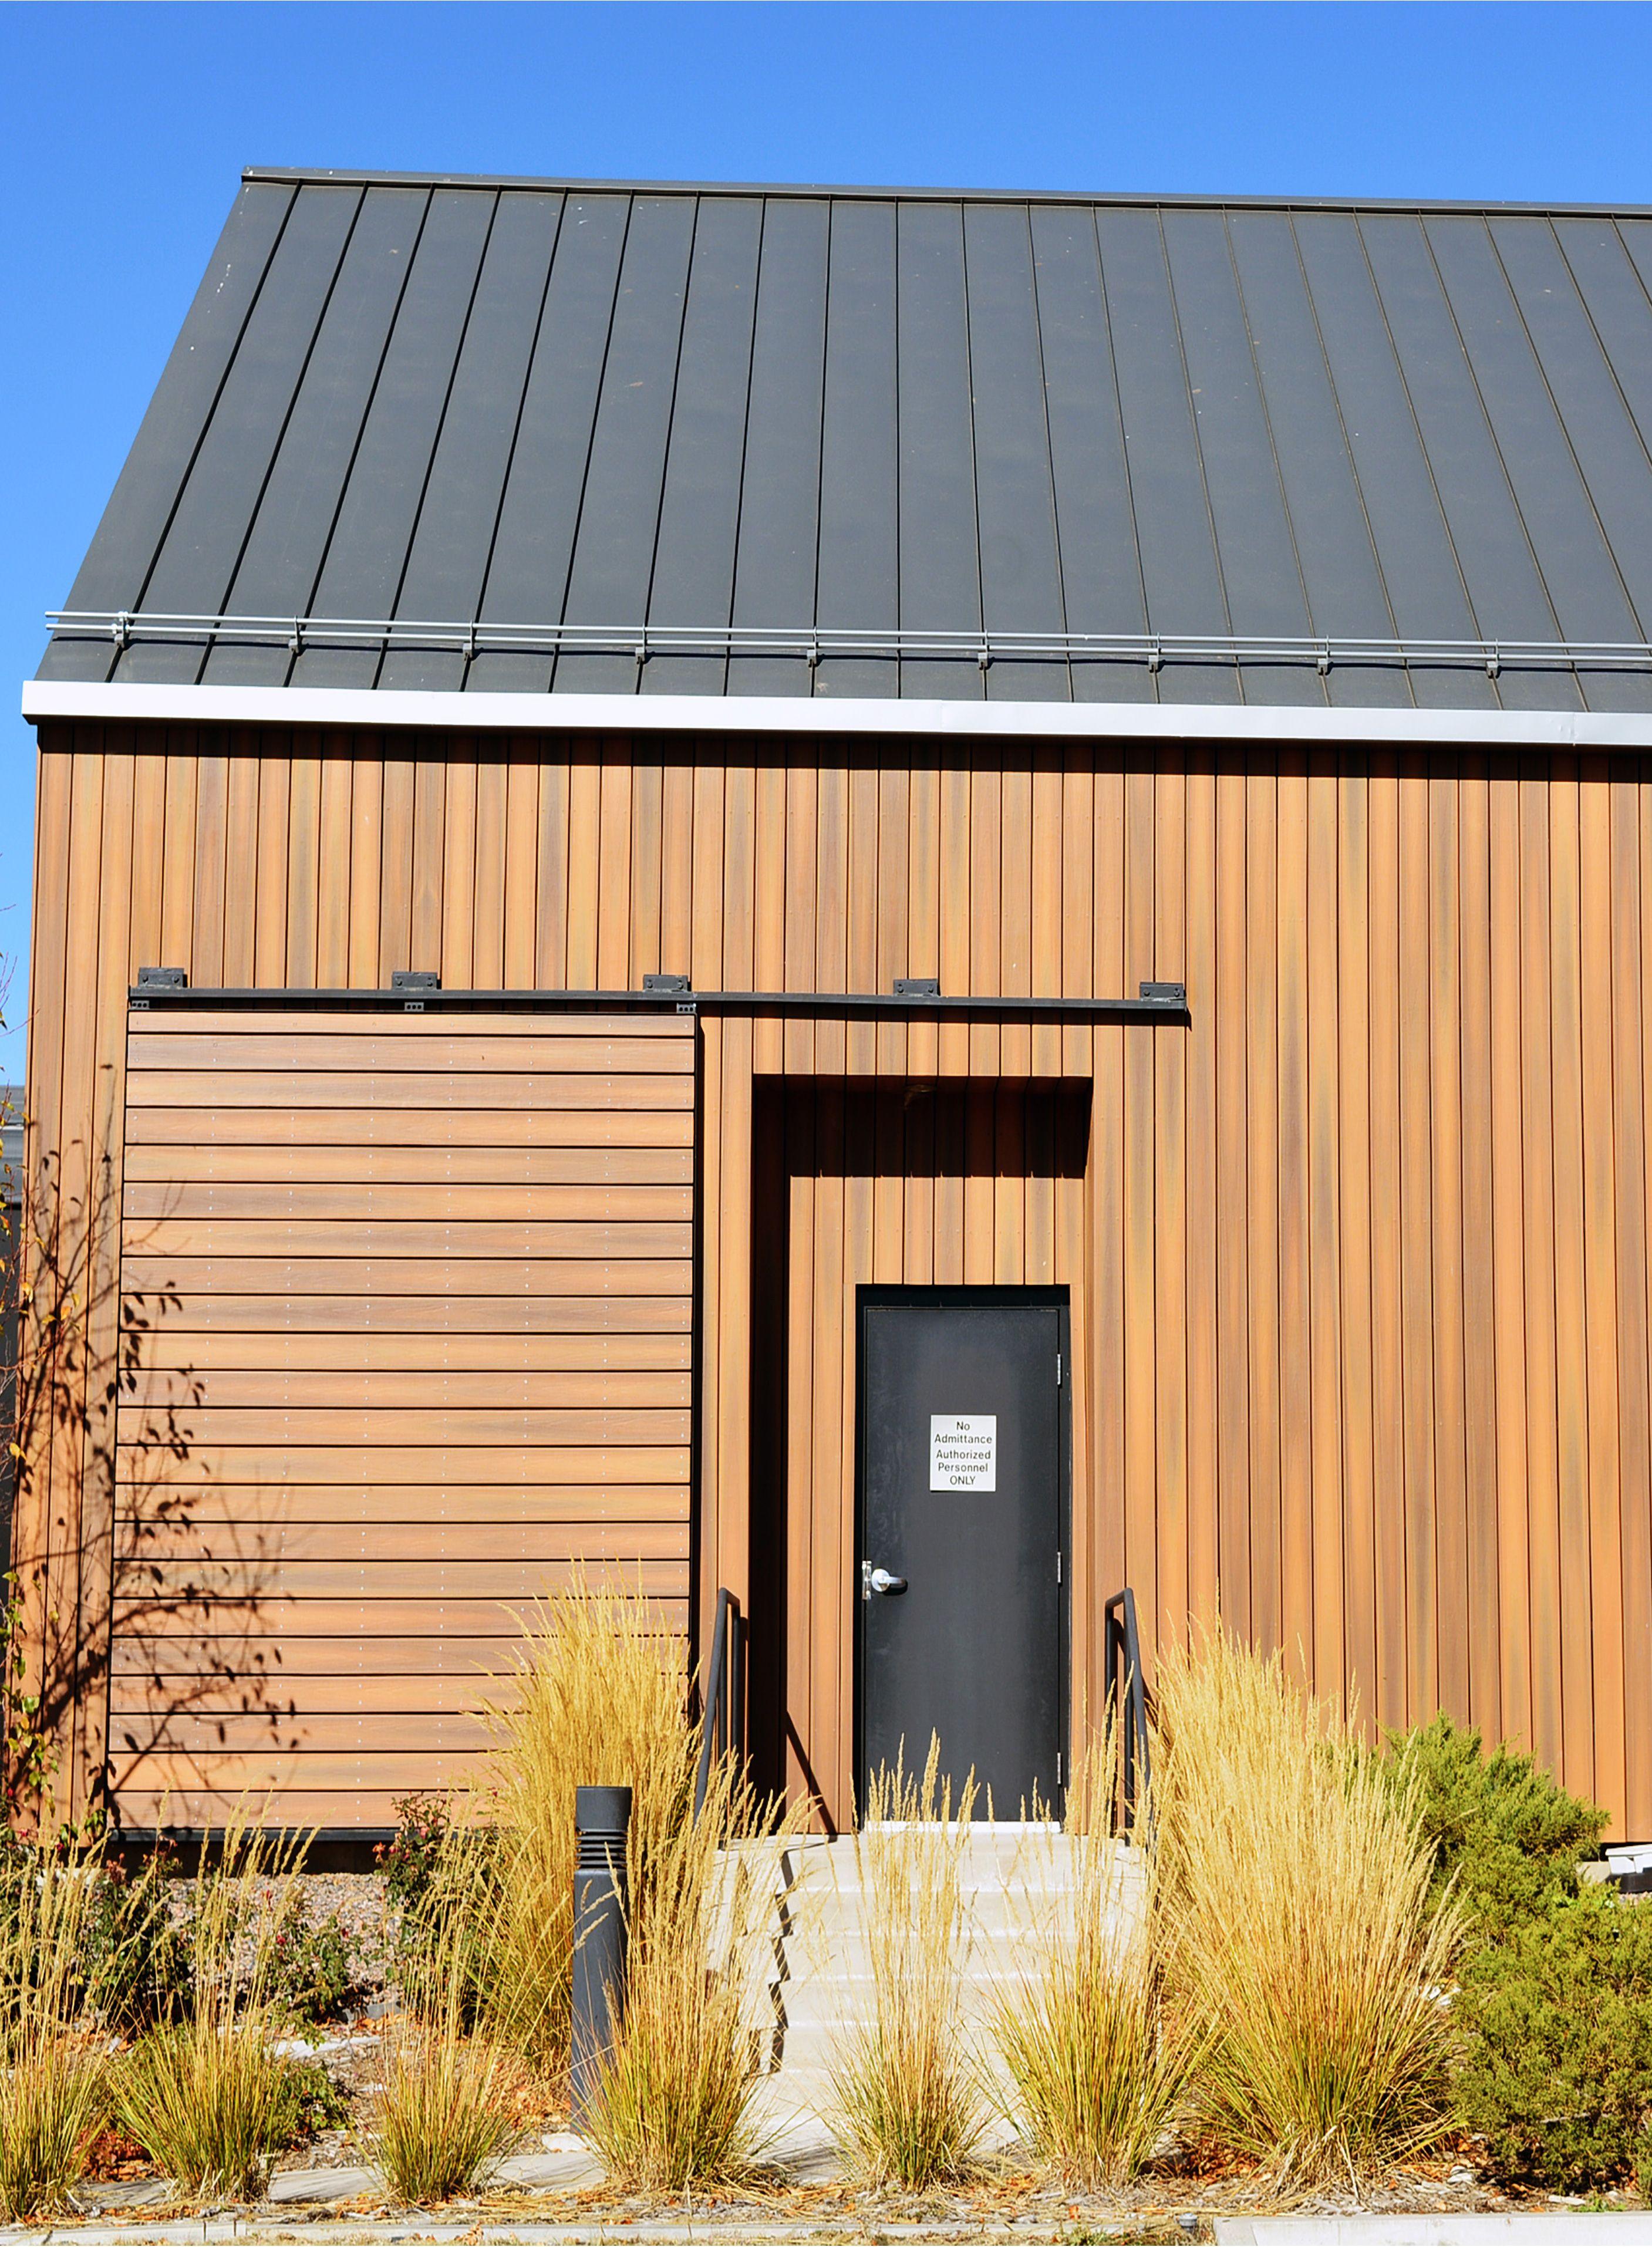 Composite Wood Cladding Versus Fiber Cement Siding Take A Look Cladding Small House Exteriors Cedar Cladding